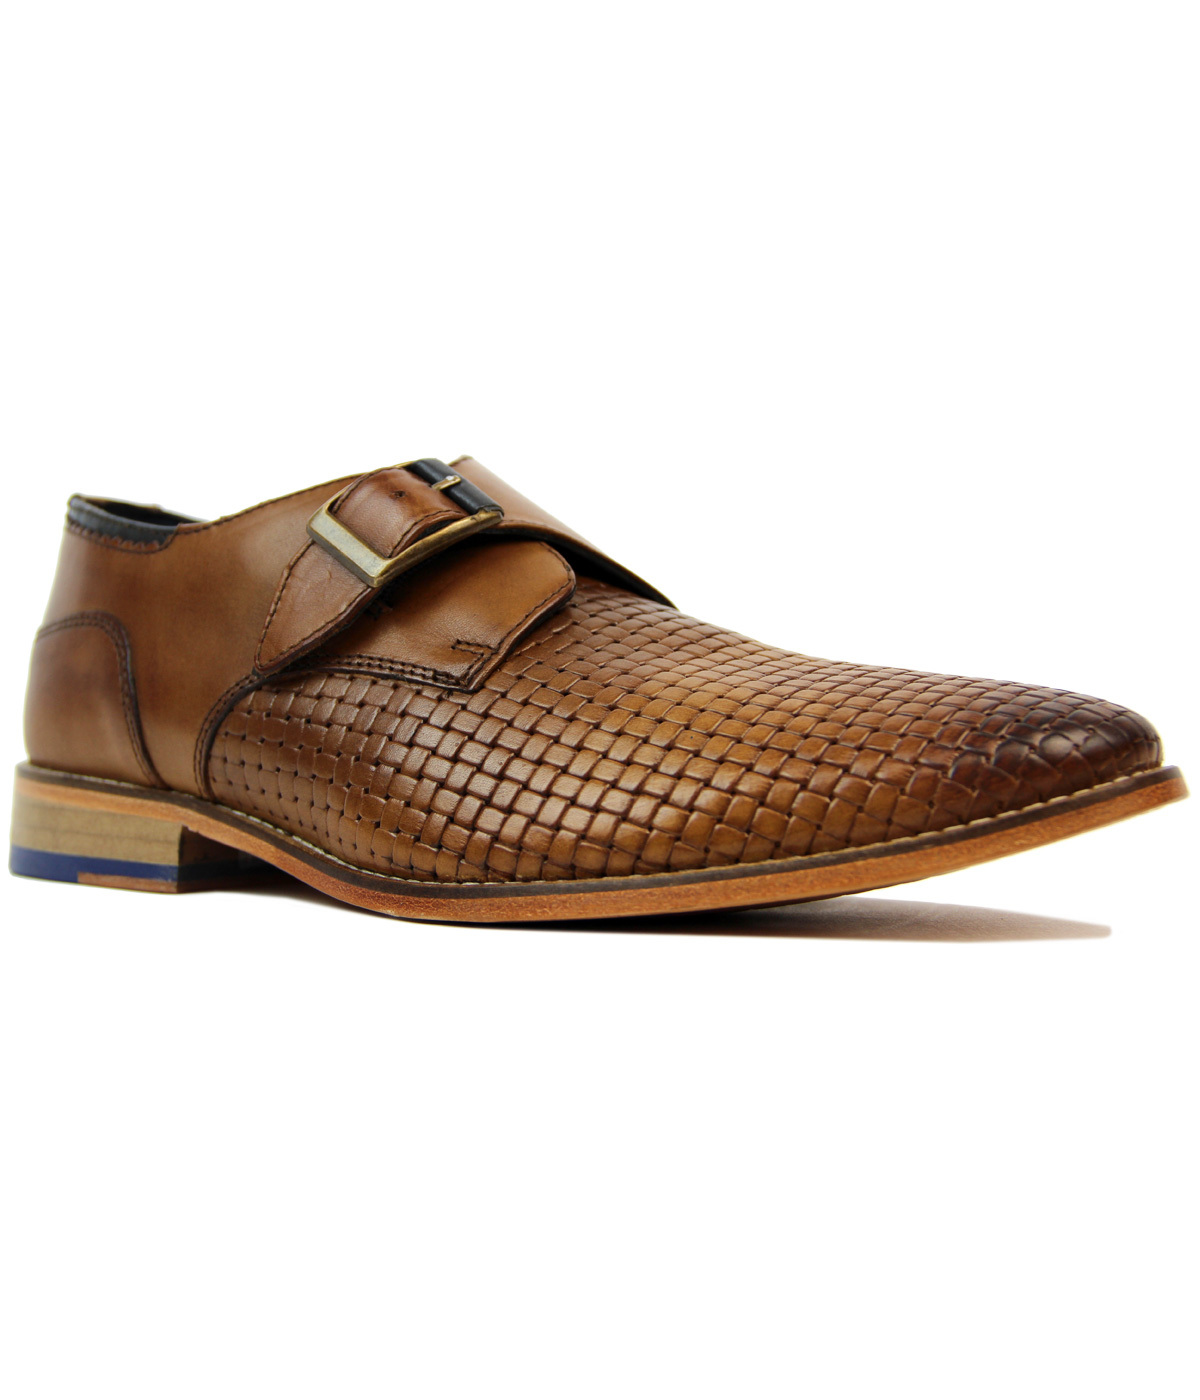 Helms Goodwin Smith Retro Mod Monk Strap Shoes